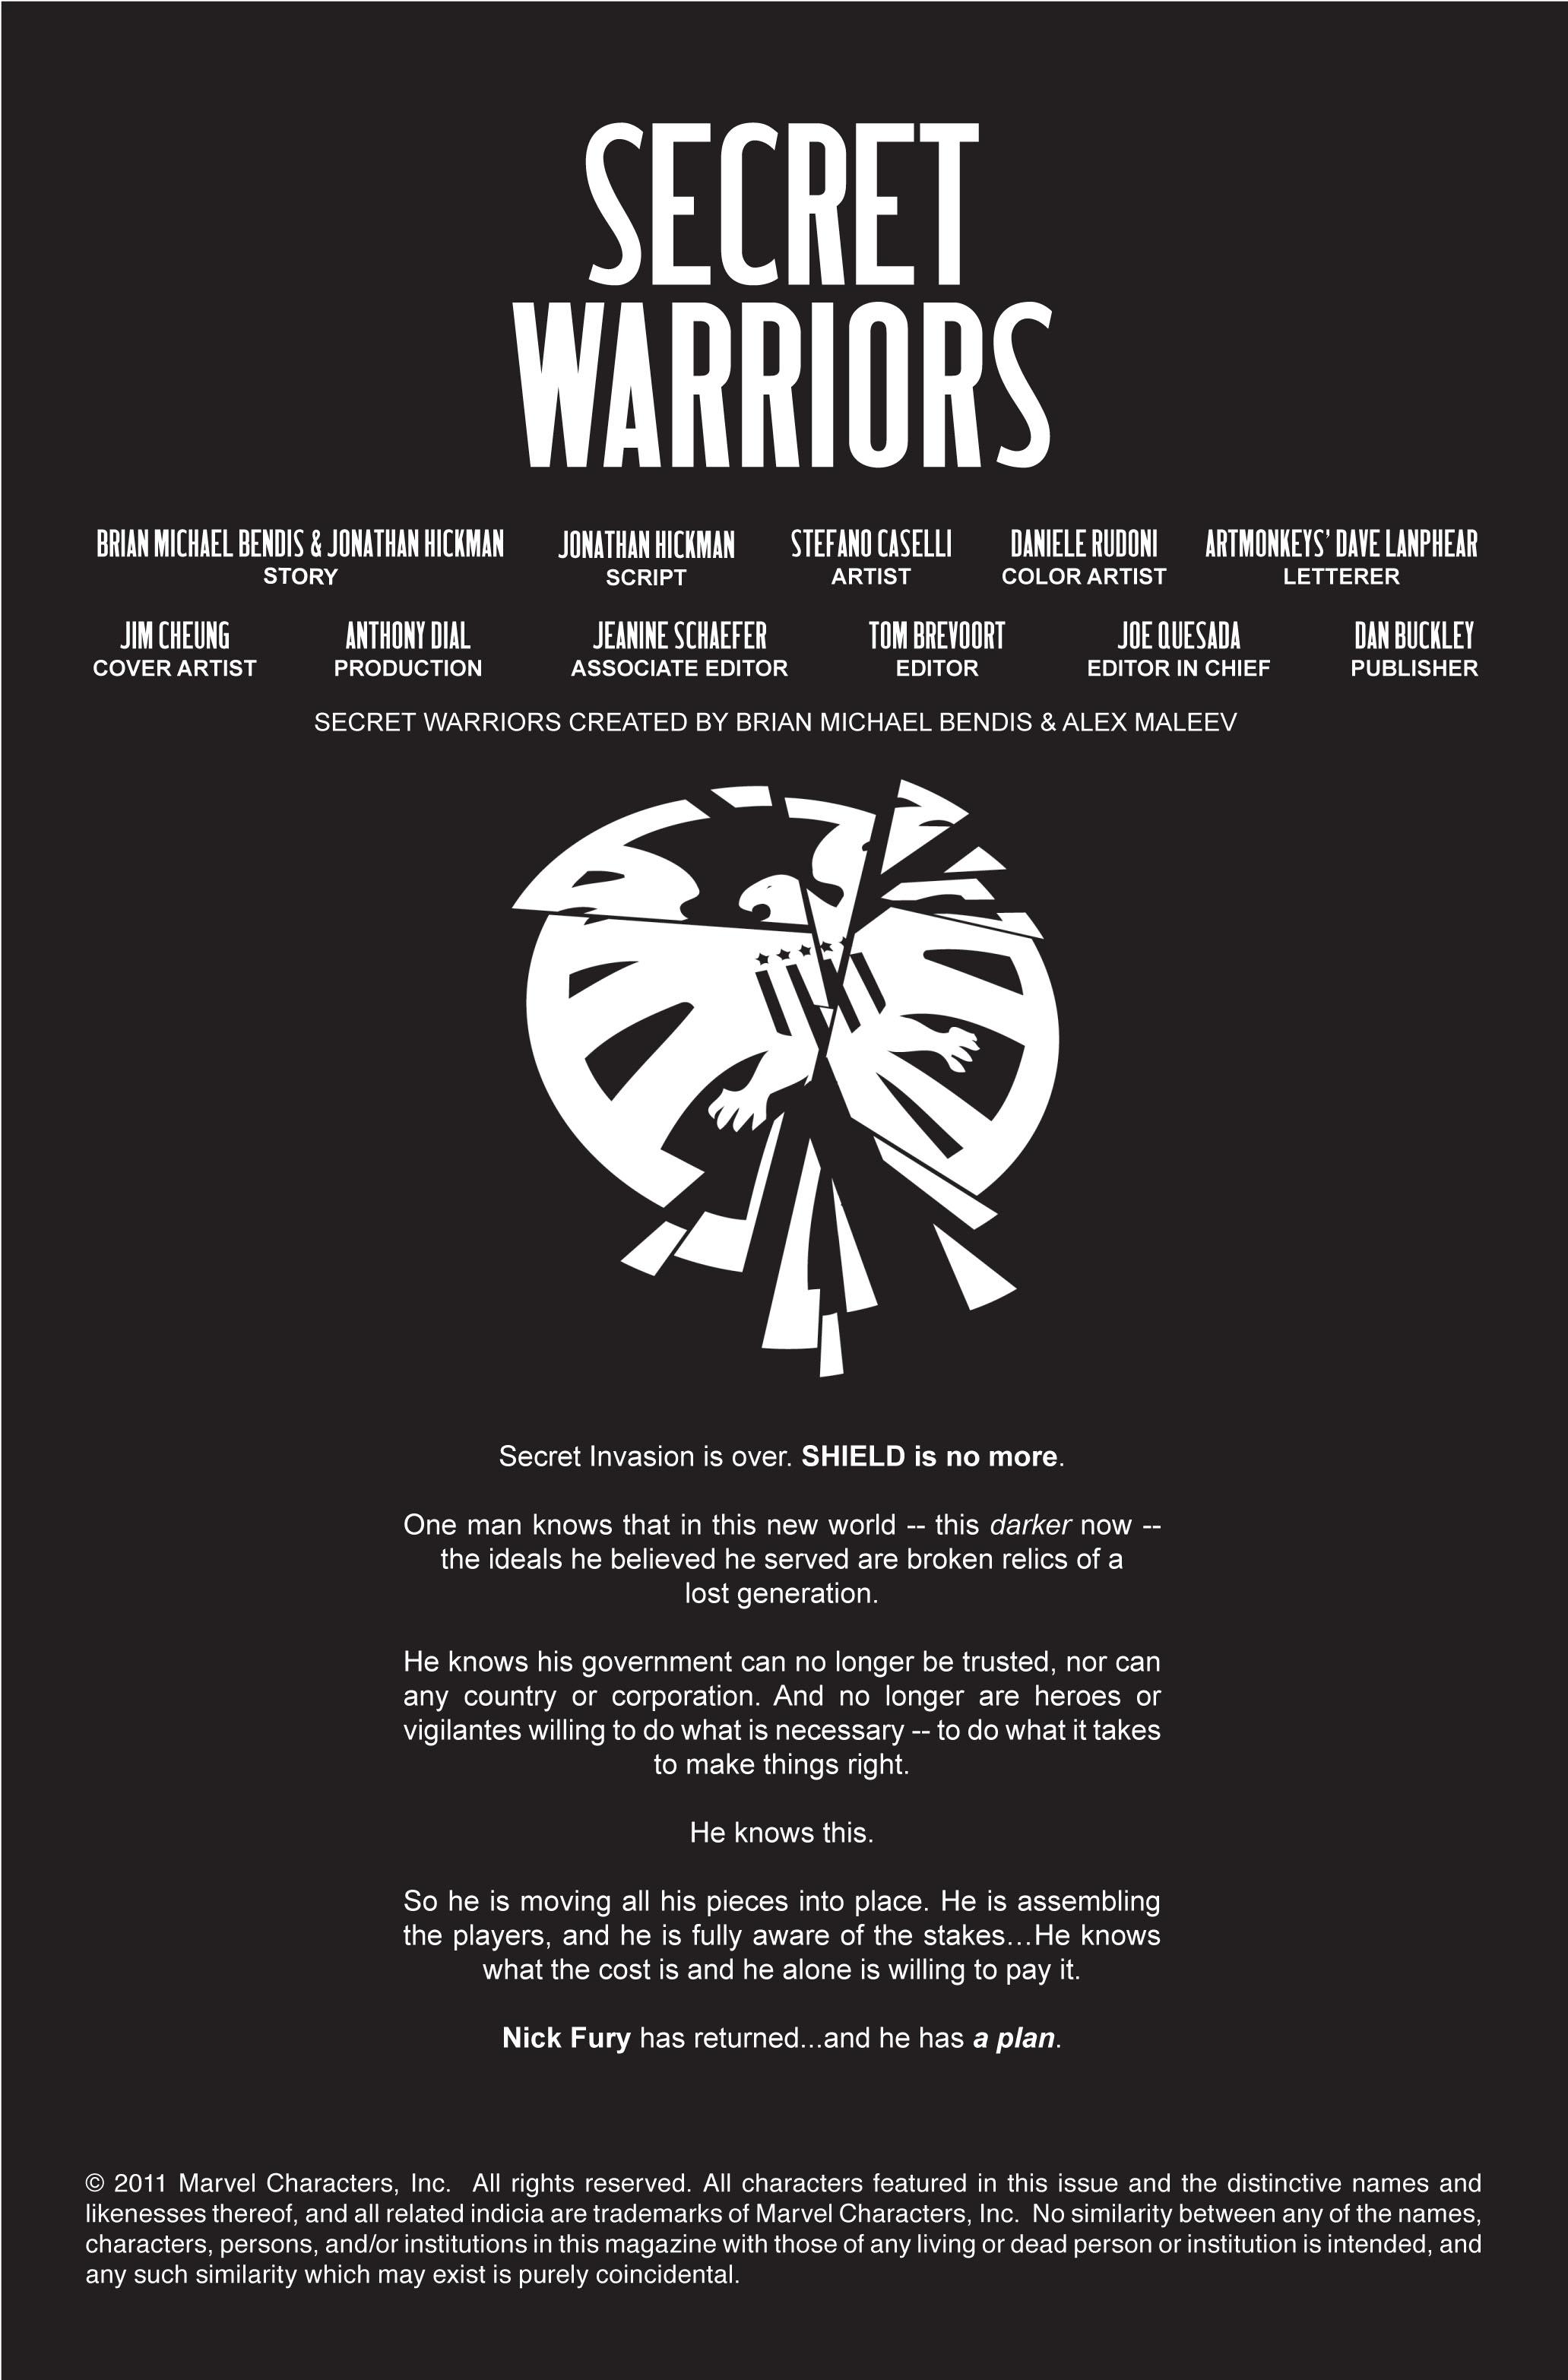 Read online Secret Warriors comic -  Issue #1 - 3